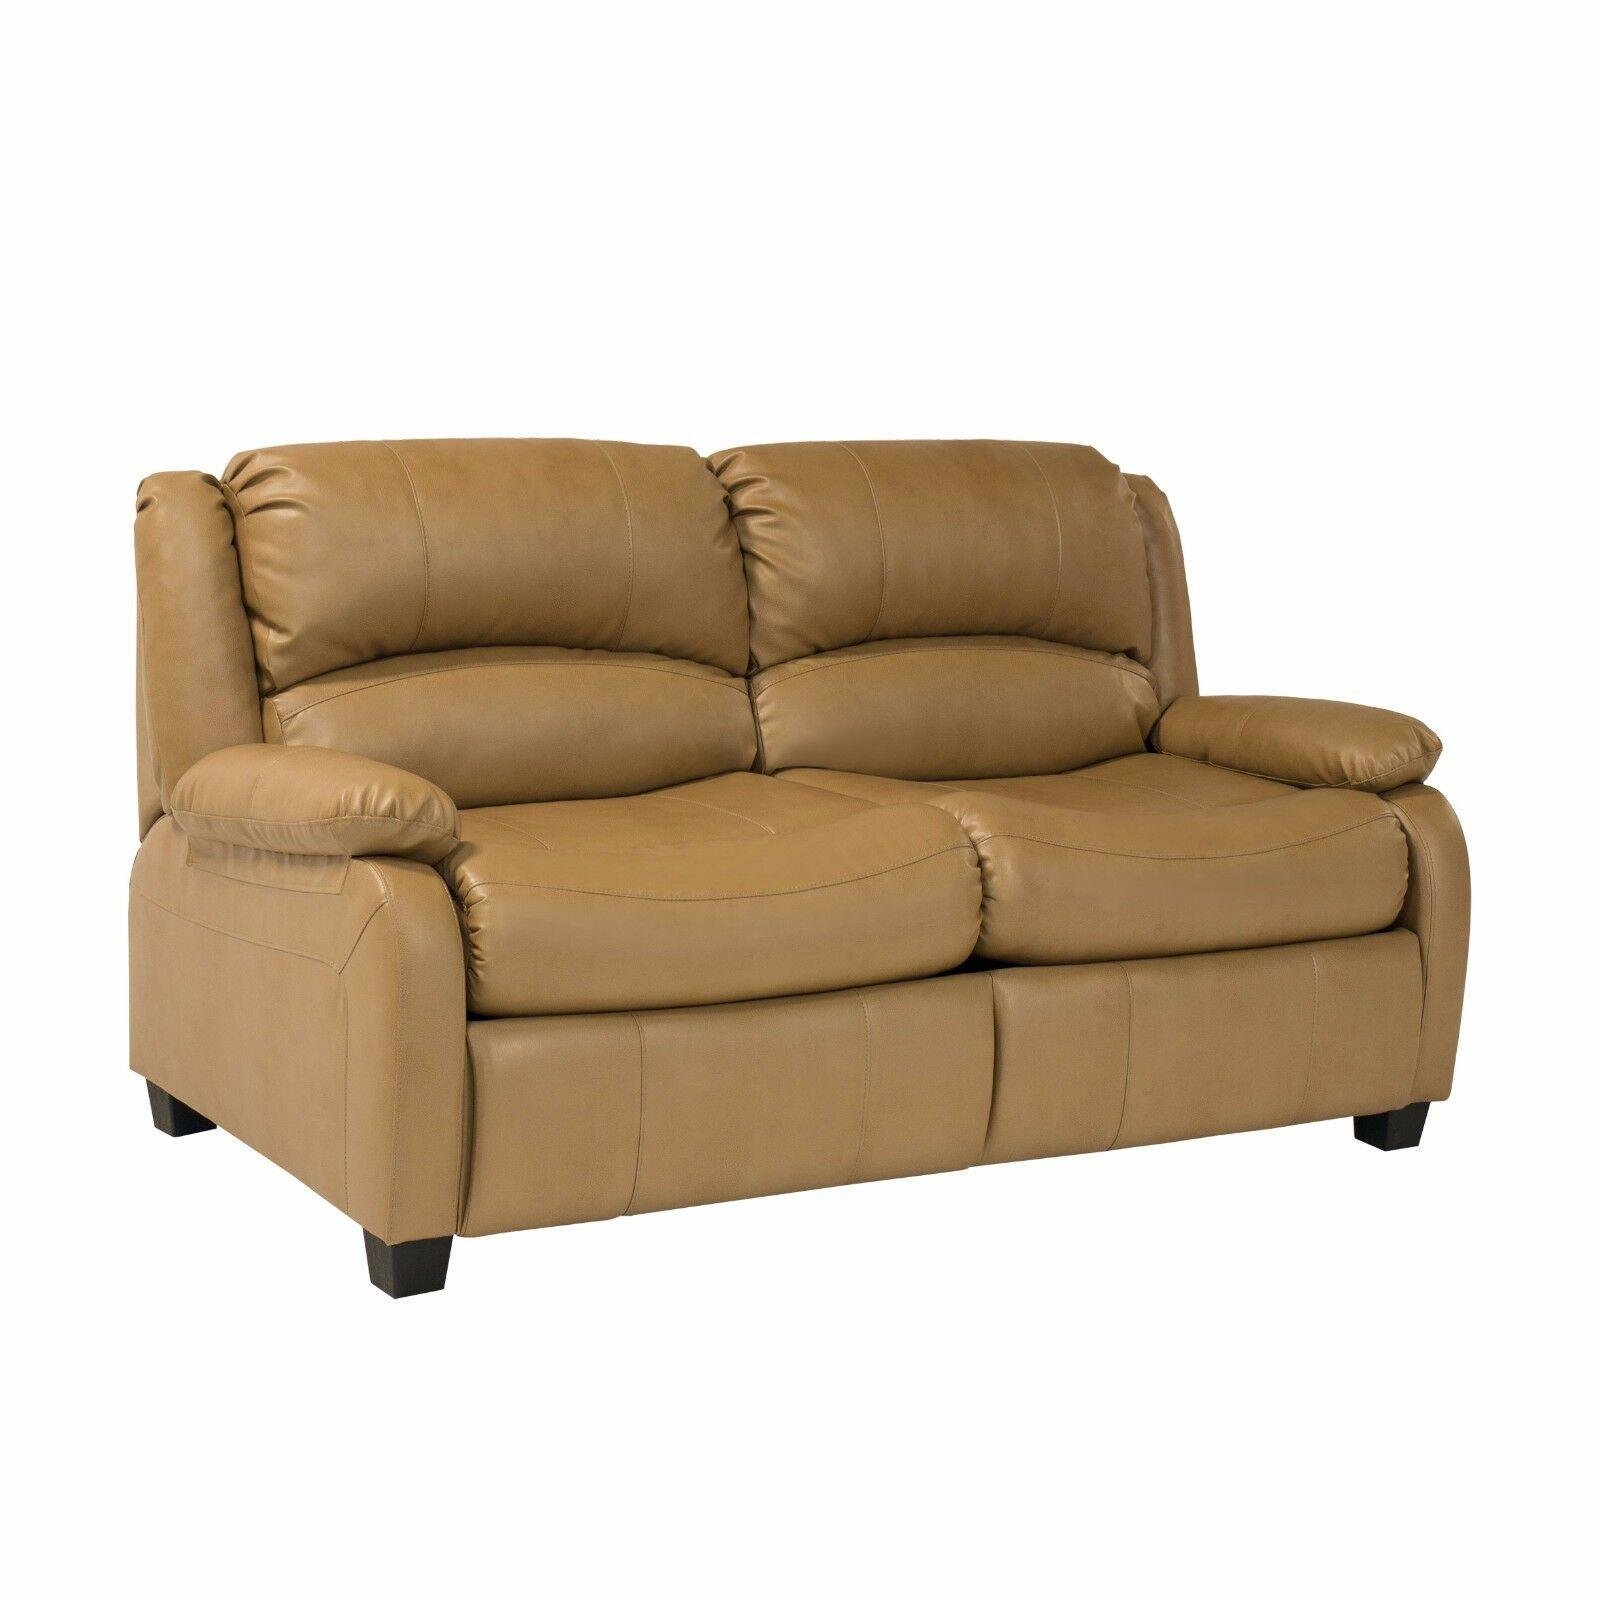 Recpro Charles  Rv Hide A Bed Sofa Sleeper Toffee Memory Foam